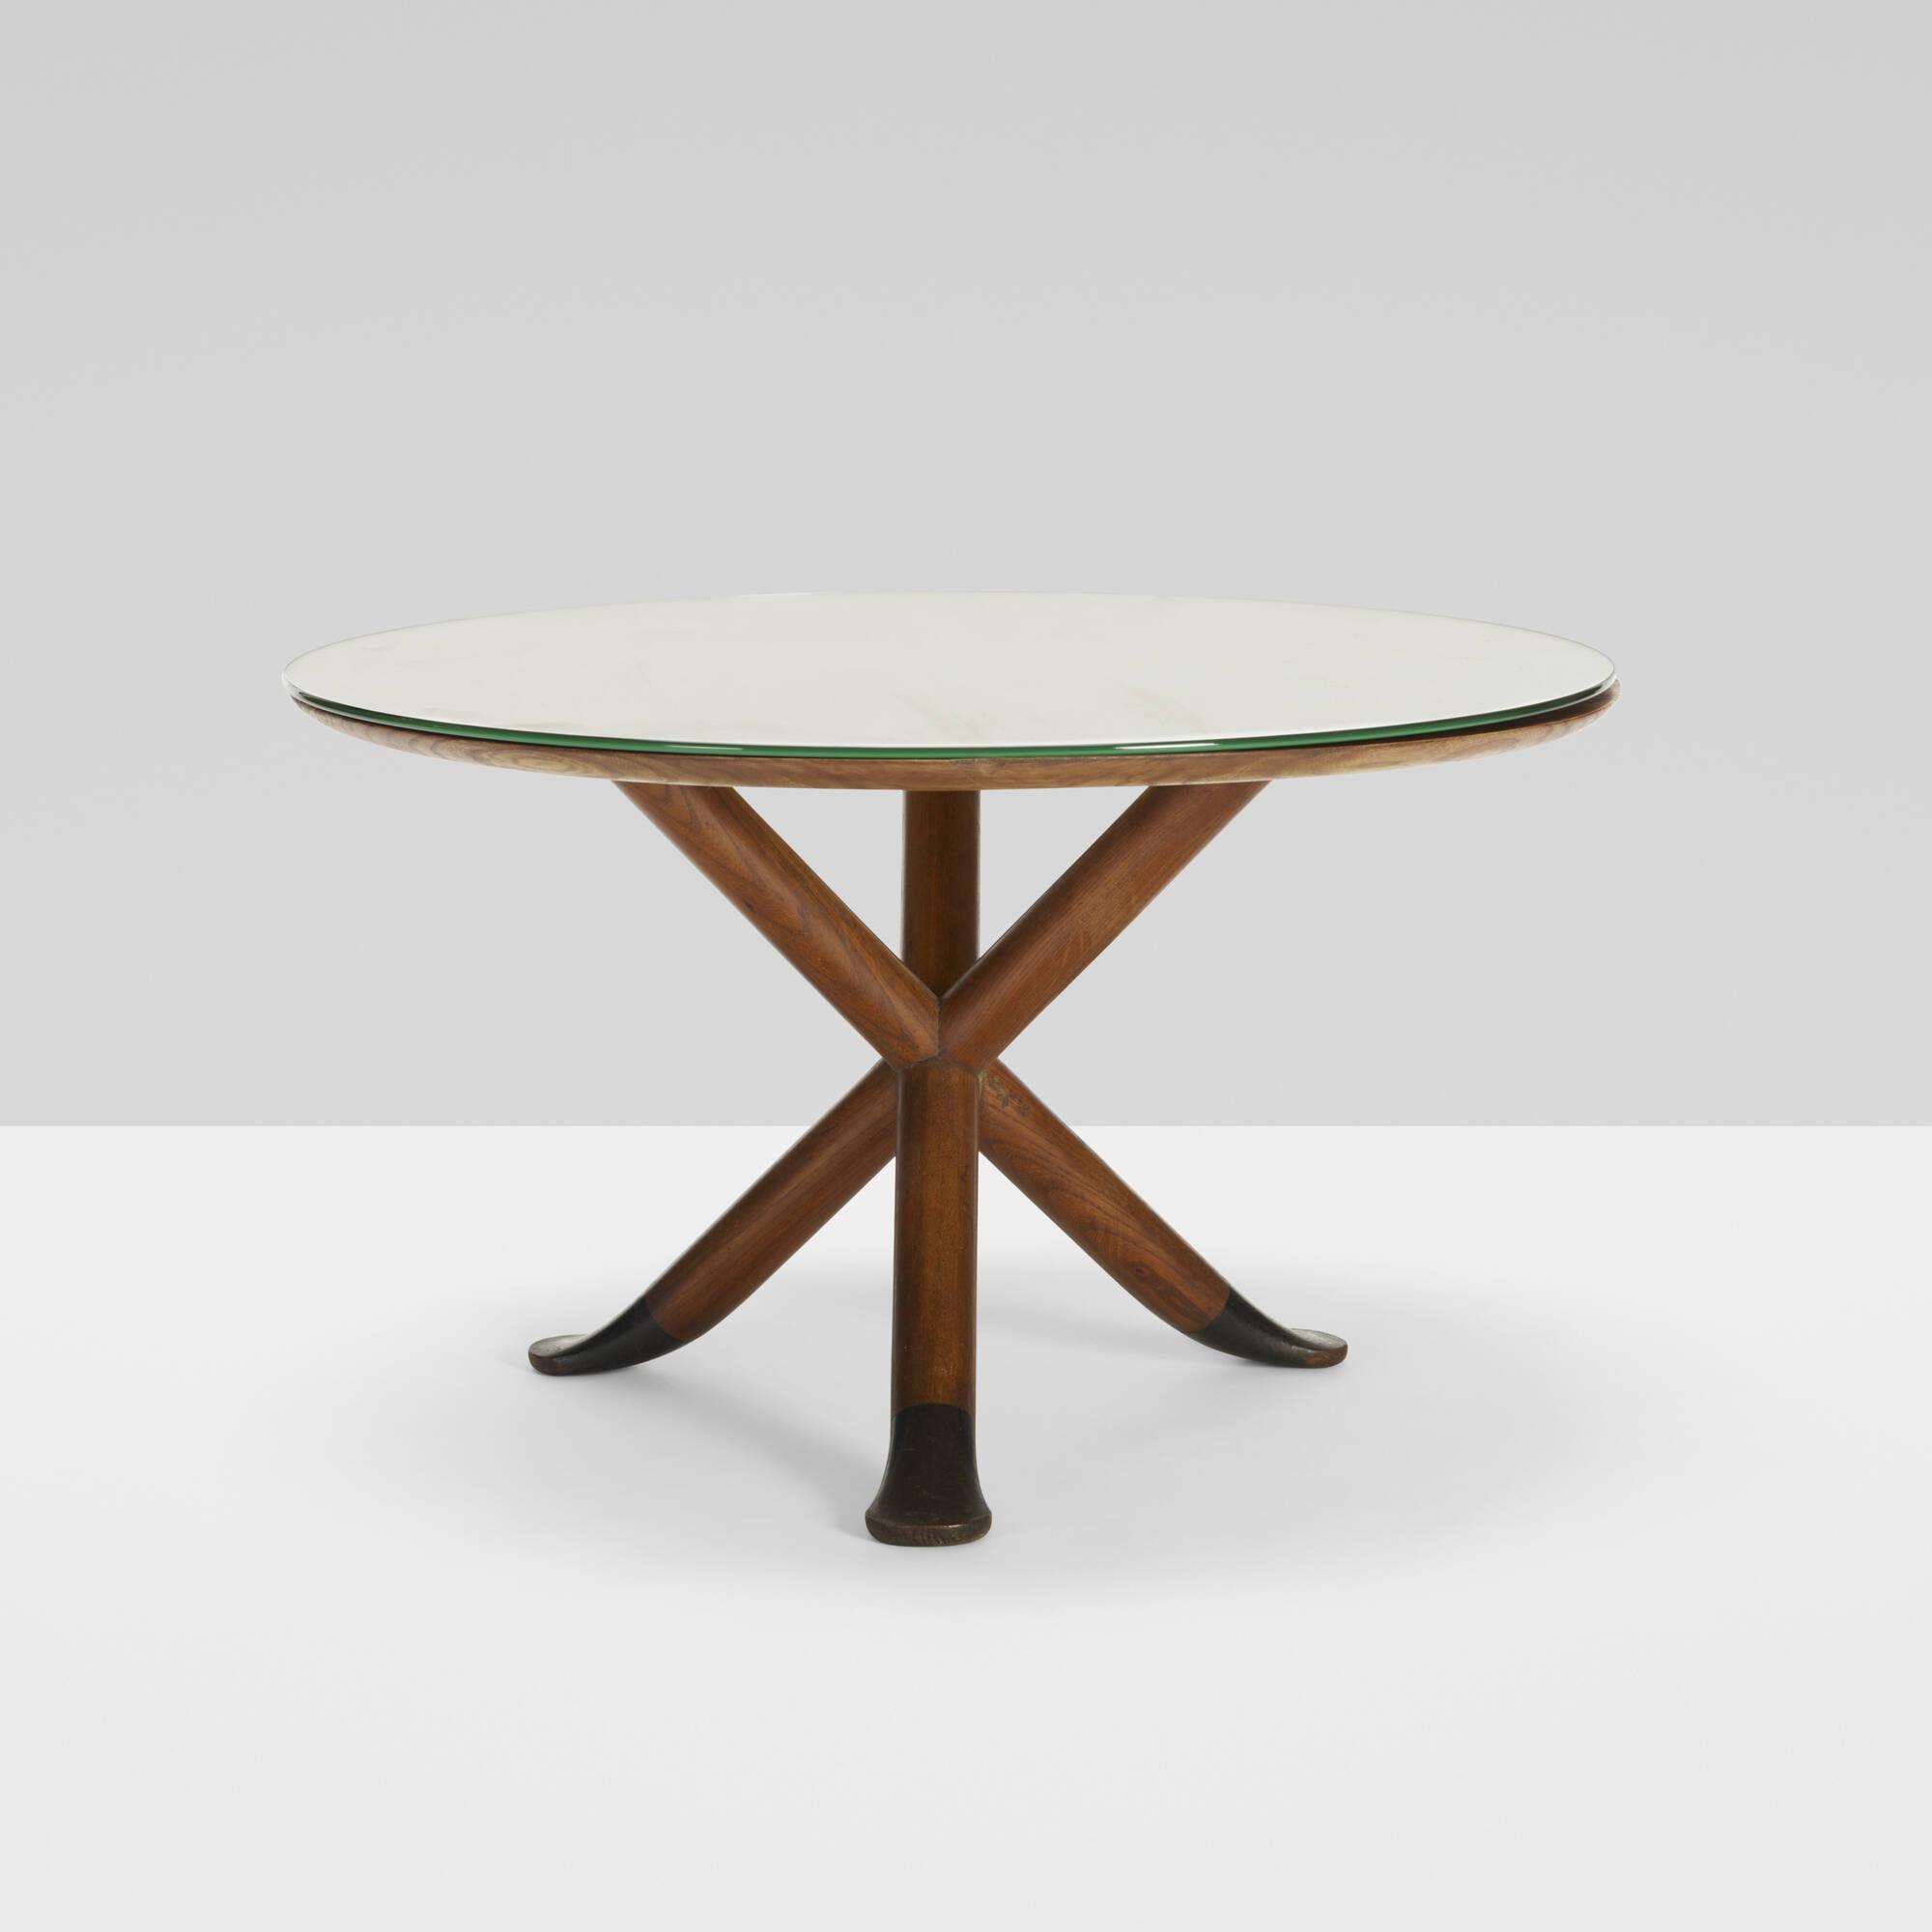 232: Pietro Chiesa / coffee table (1 of 1)